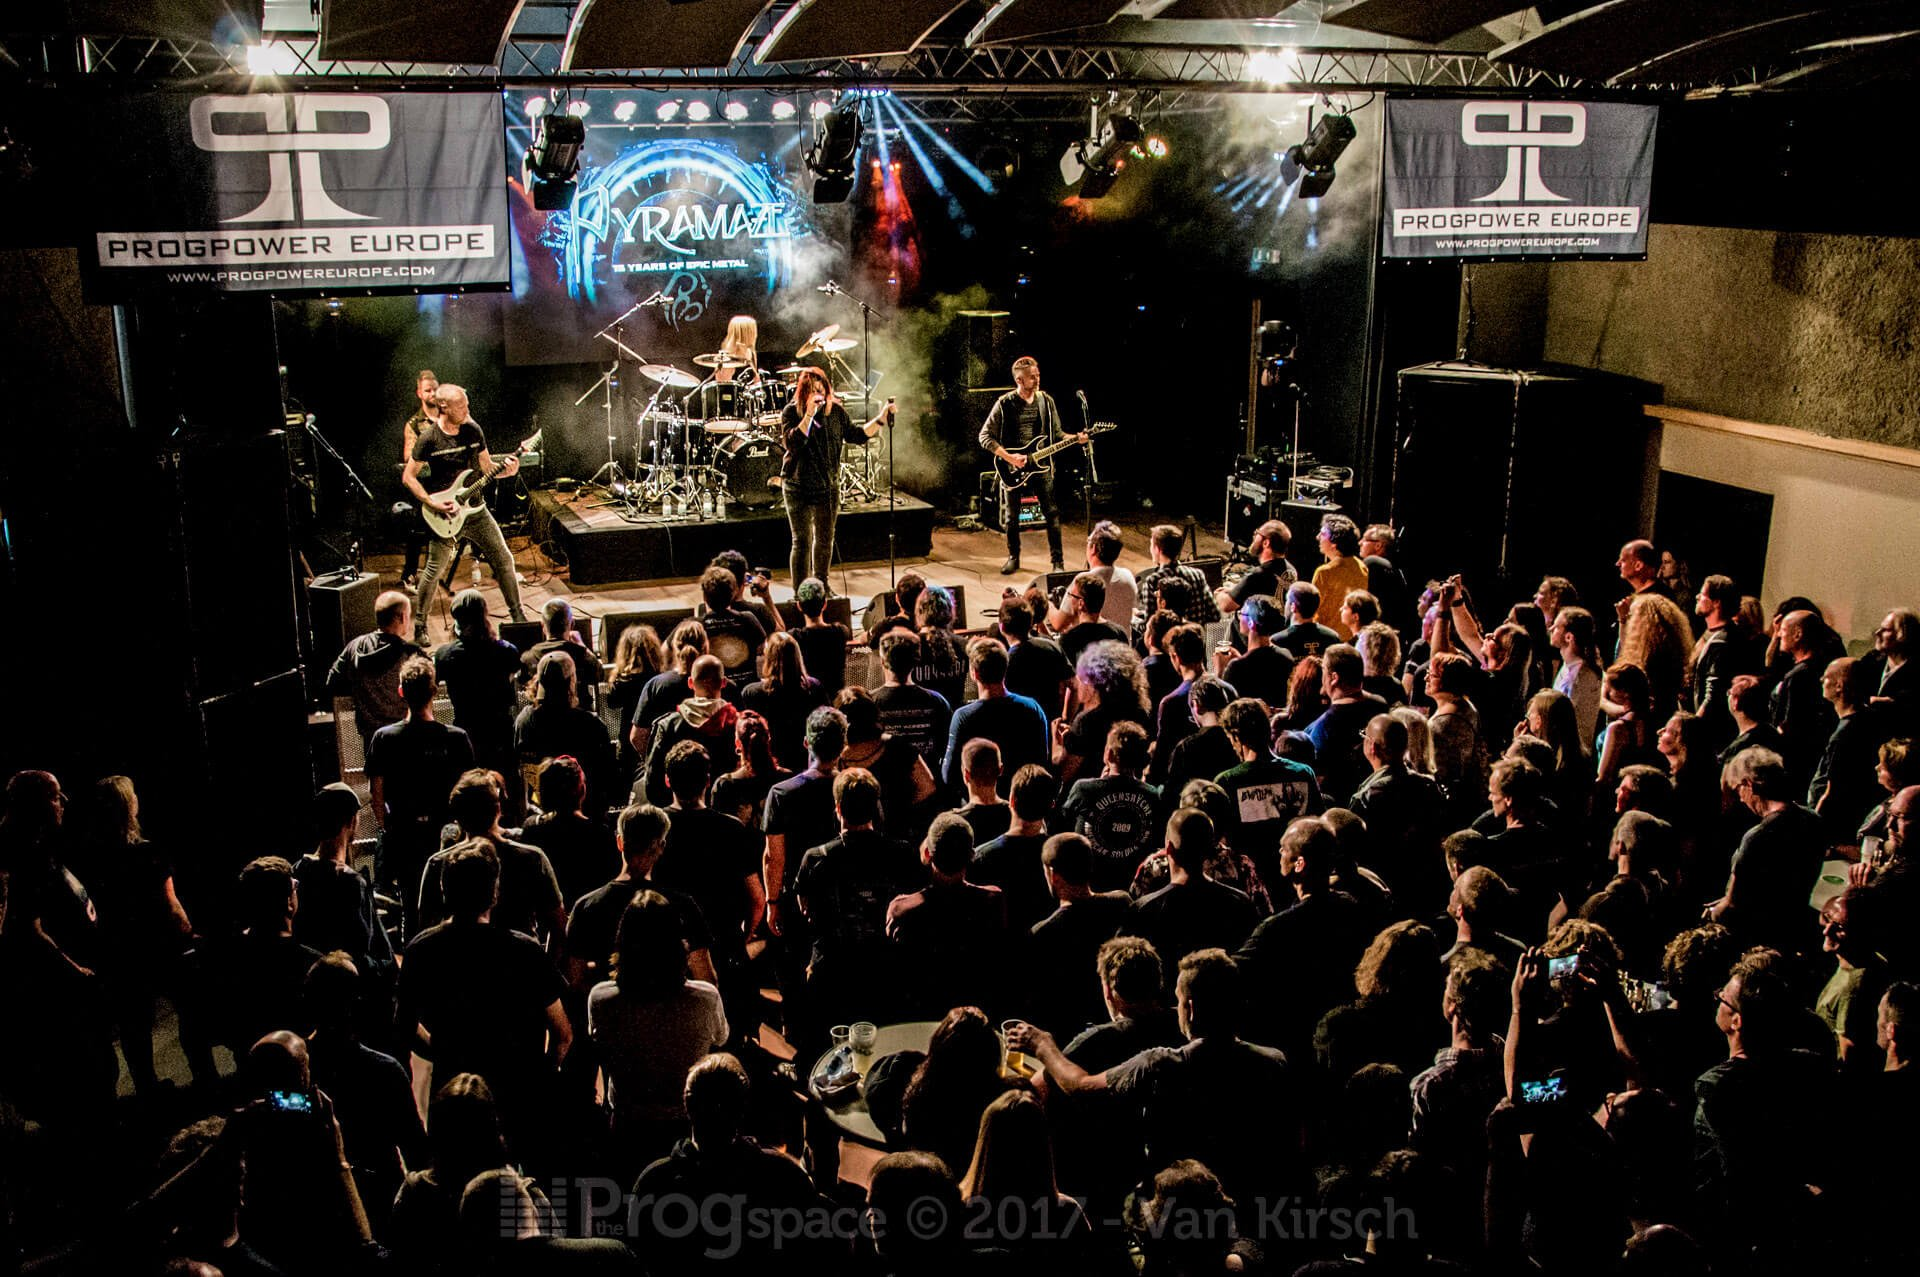 Pyramaze at ProgPower Europe 2017